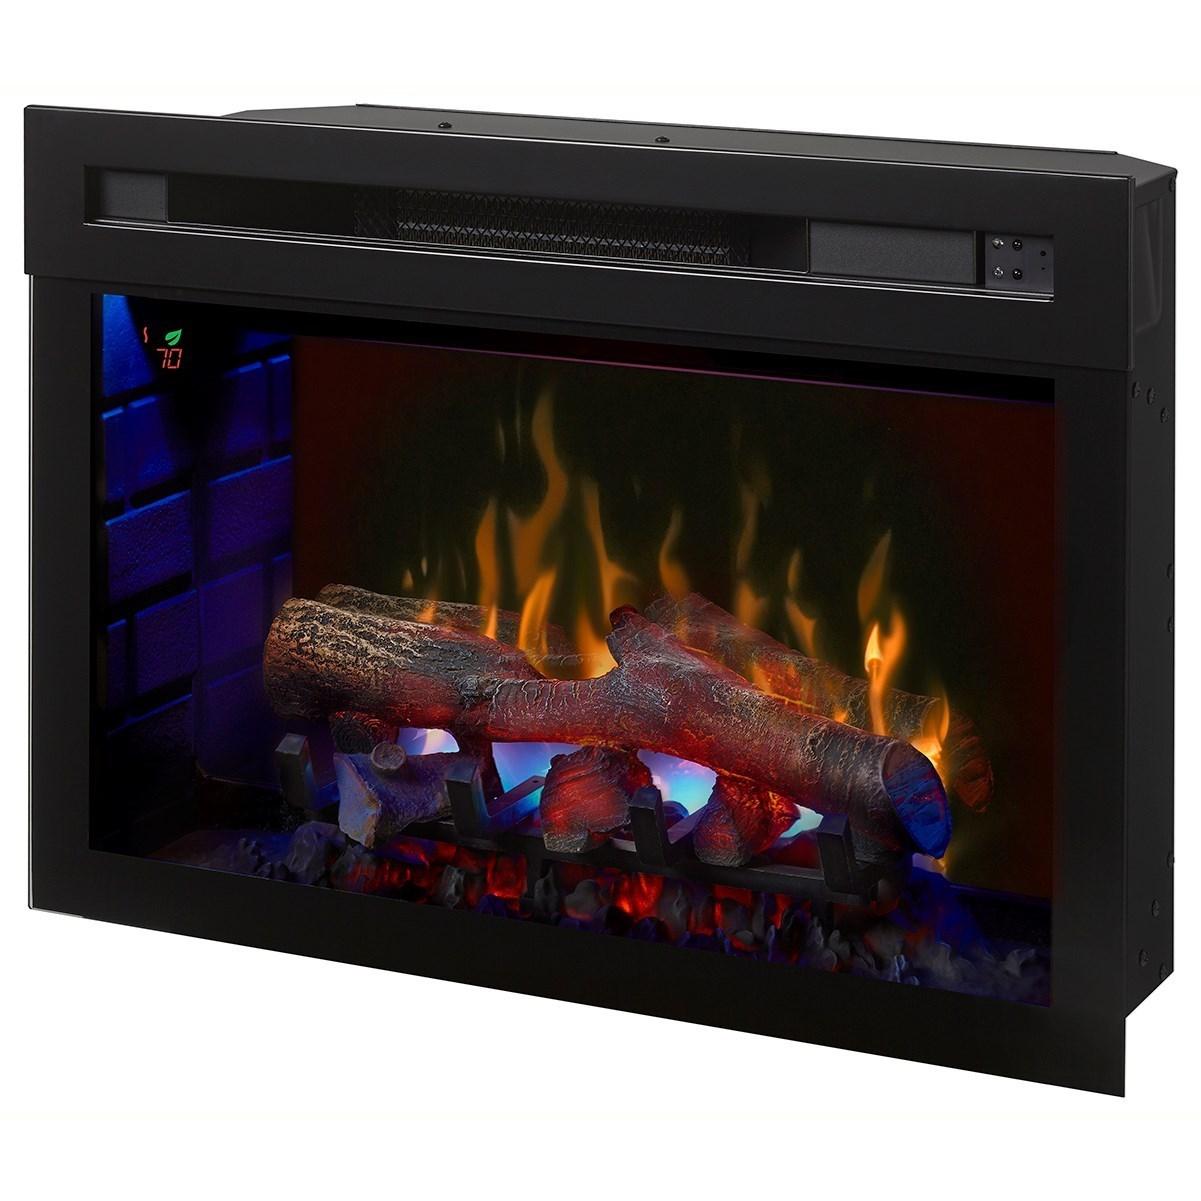 Henderson Dimplex 25 Inch Multi-Fire XD Electric Firebox by Dimplex at Darvin Furniture